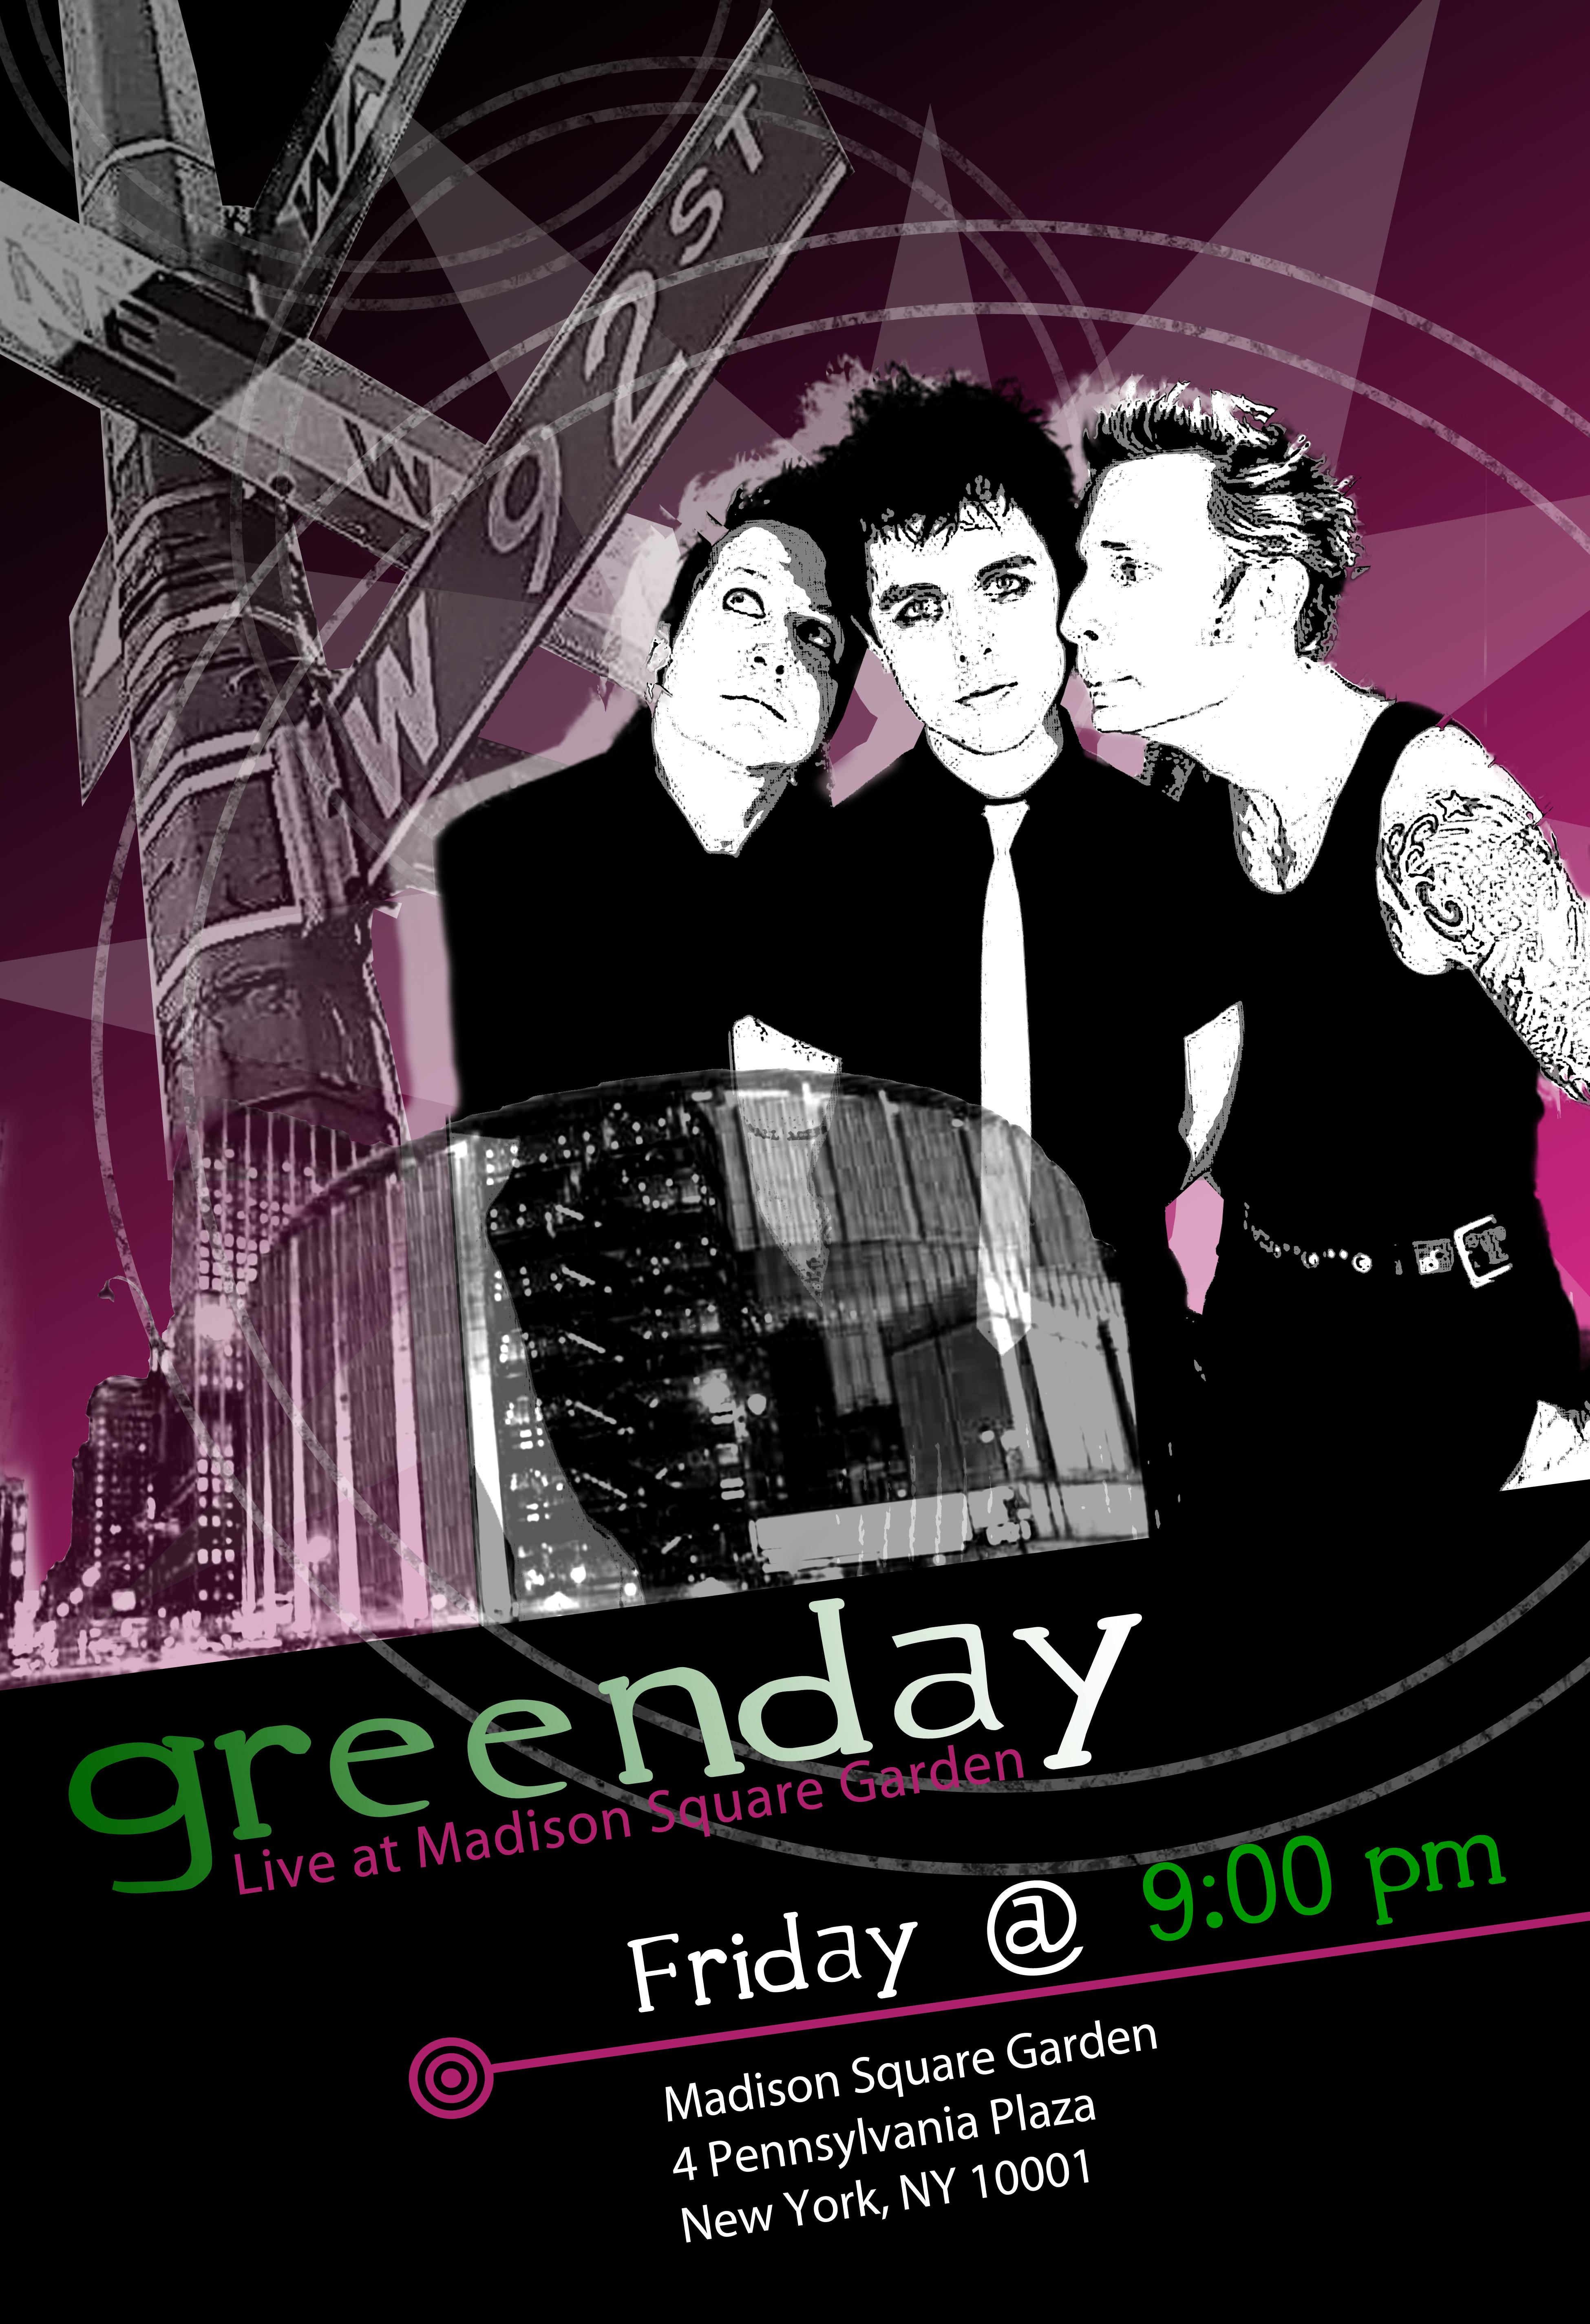 Greenday_Poster_by_Meggz86.jpg